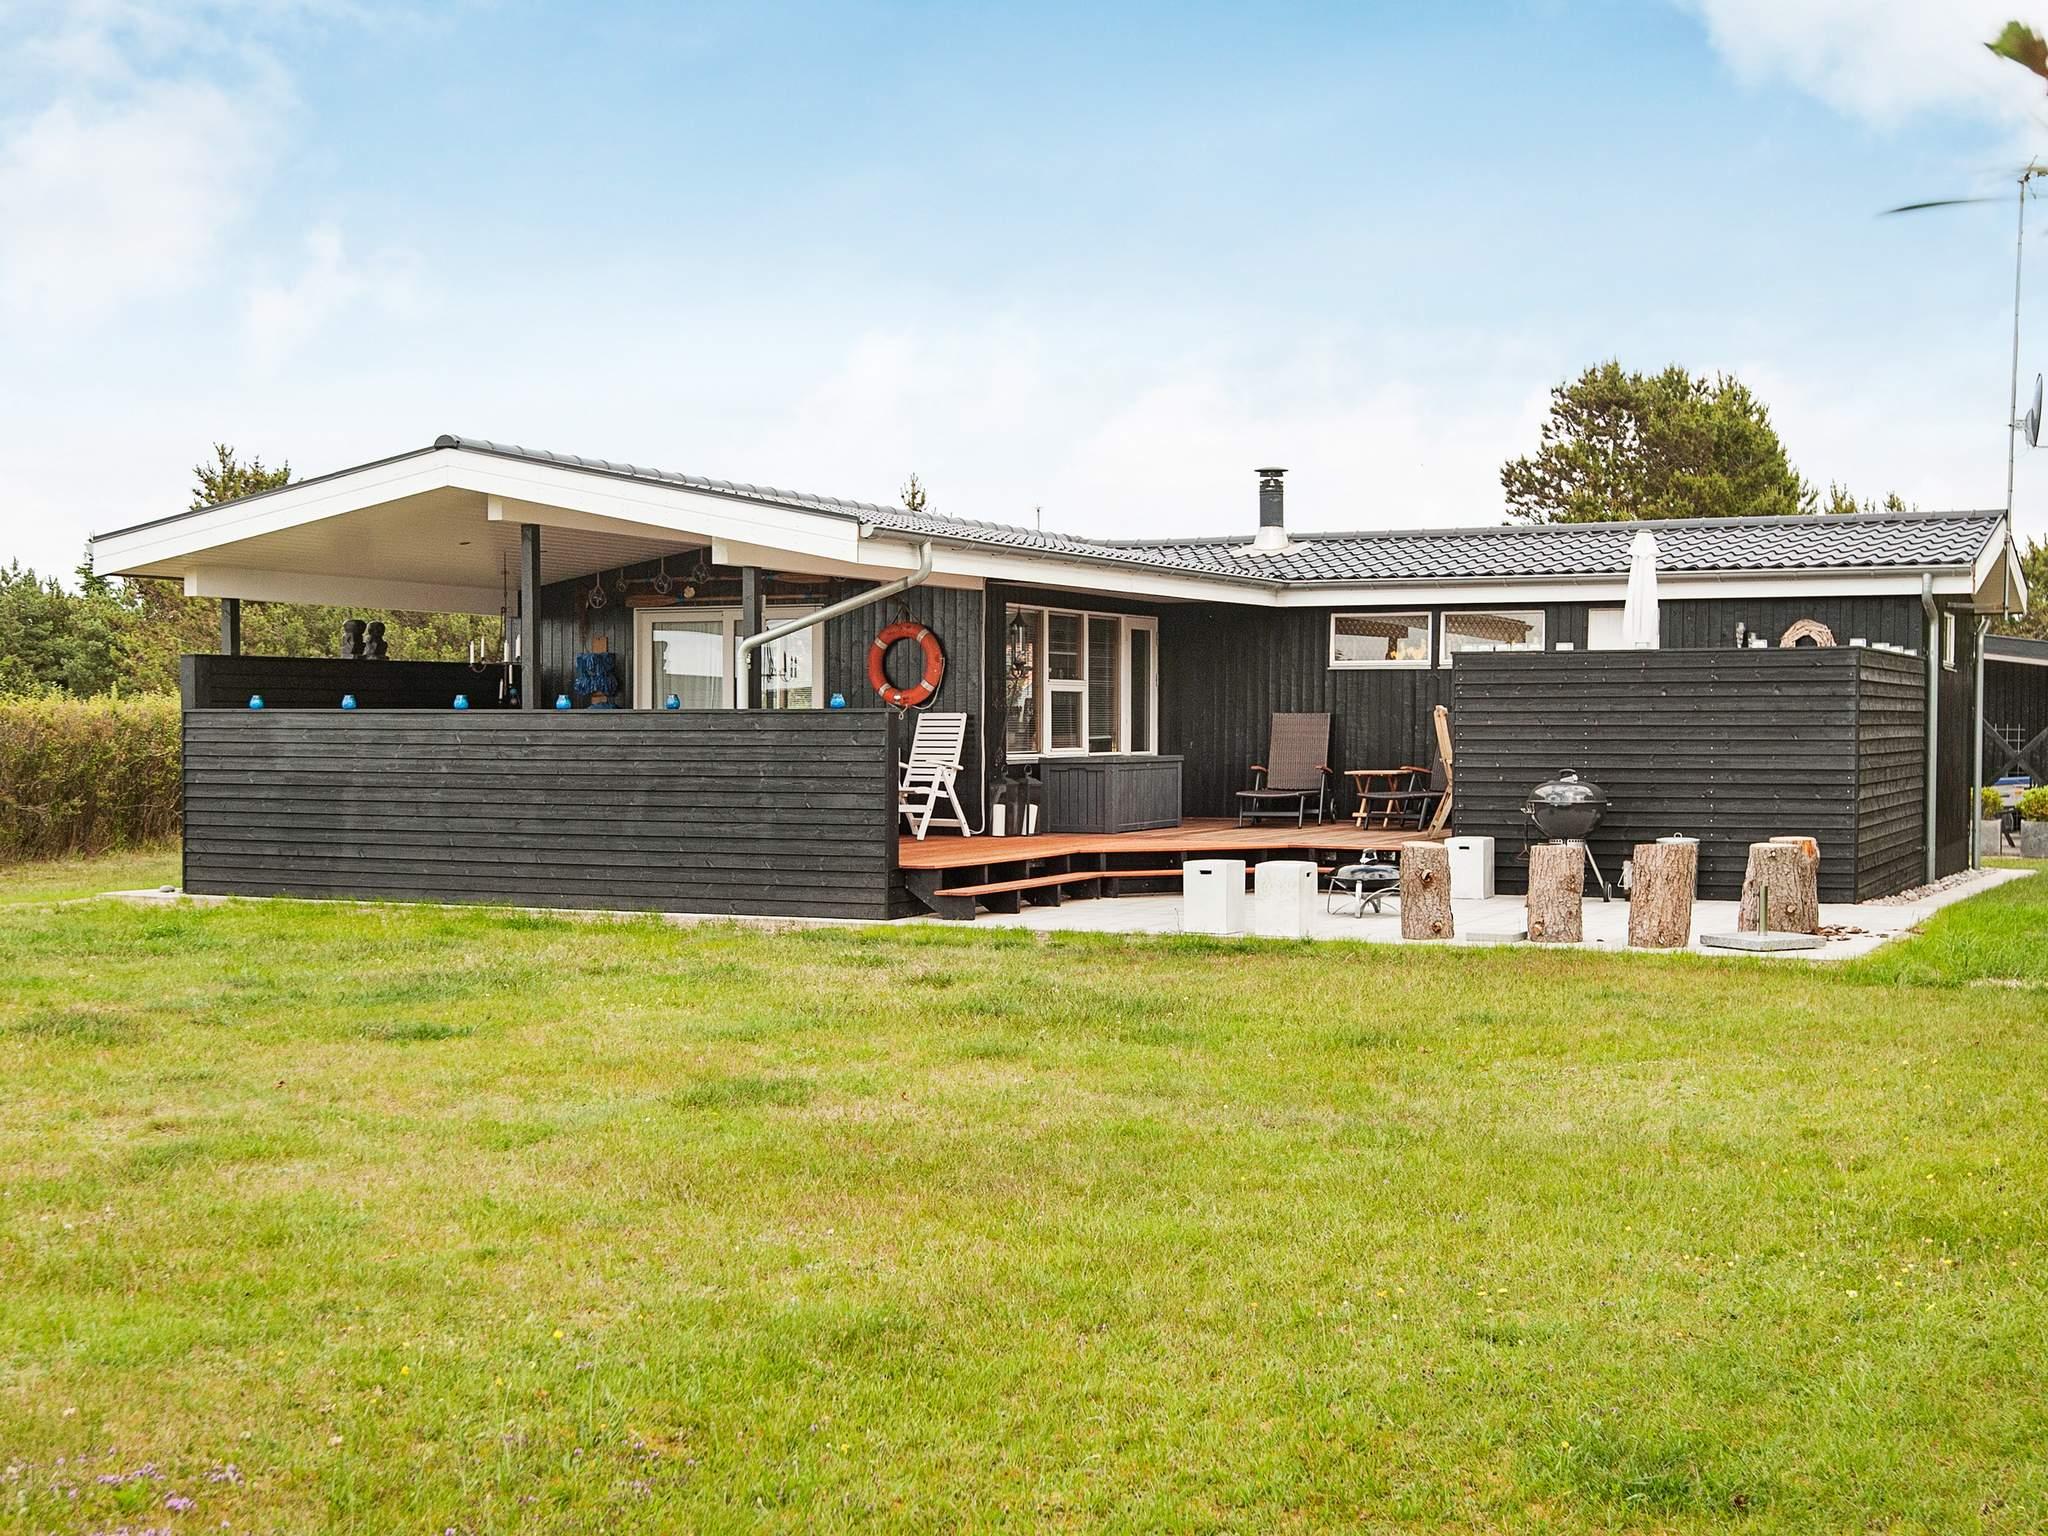 Ferienhaus Fjellerup Strand (89297), Fjellerup, , Ostjütland, Dänemark, Bild 29